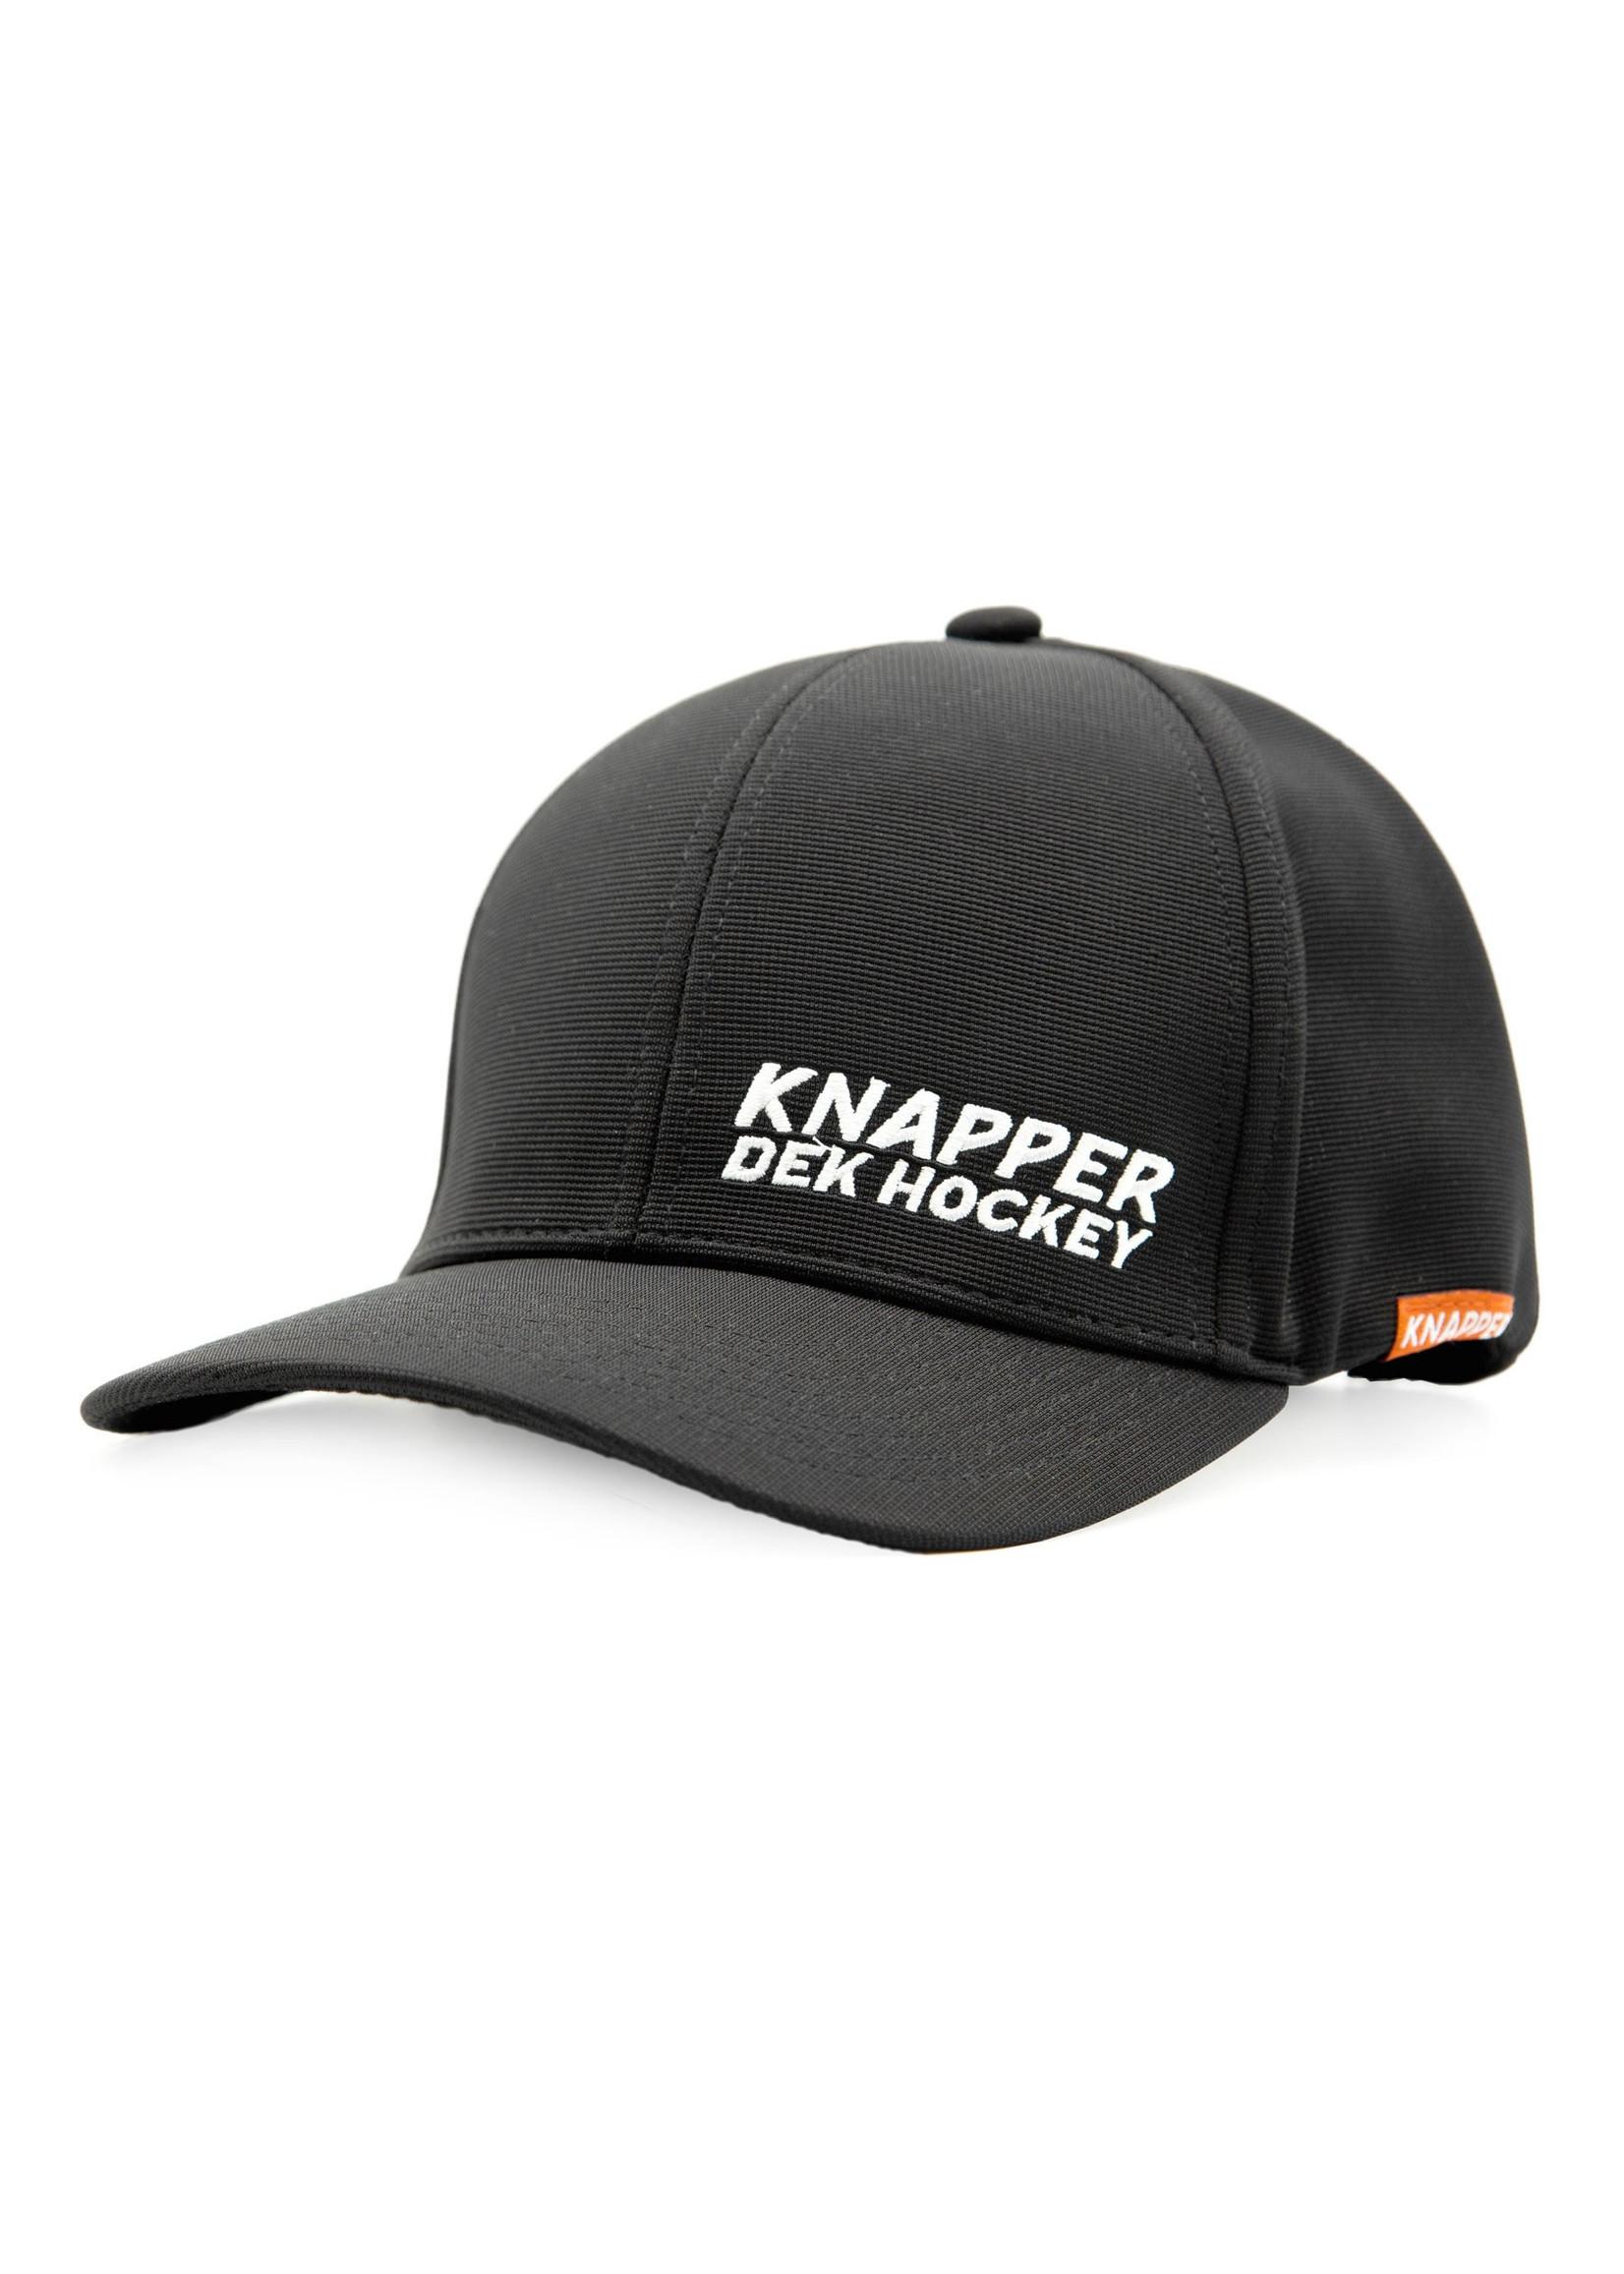 Knapper CAP DEK HOCKEY KNAPPER